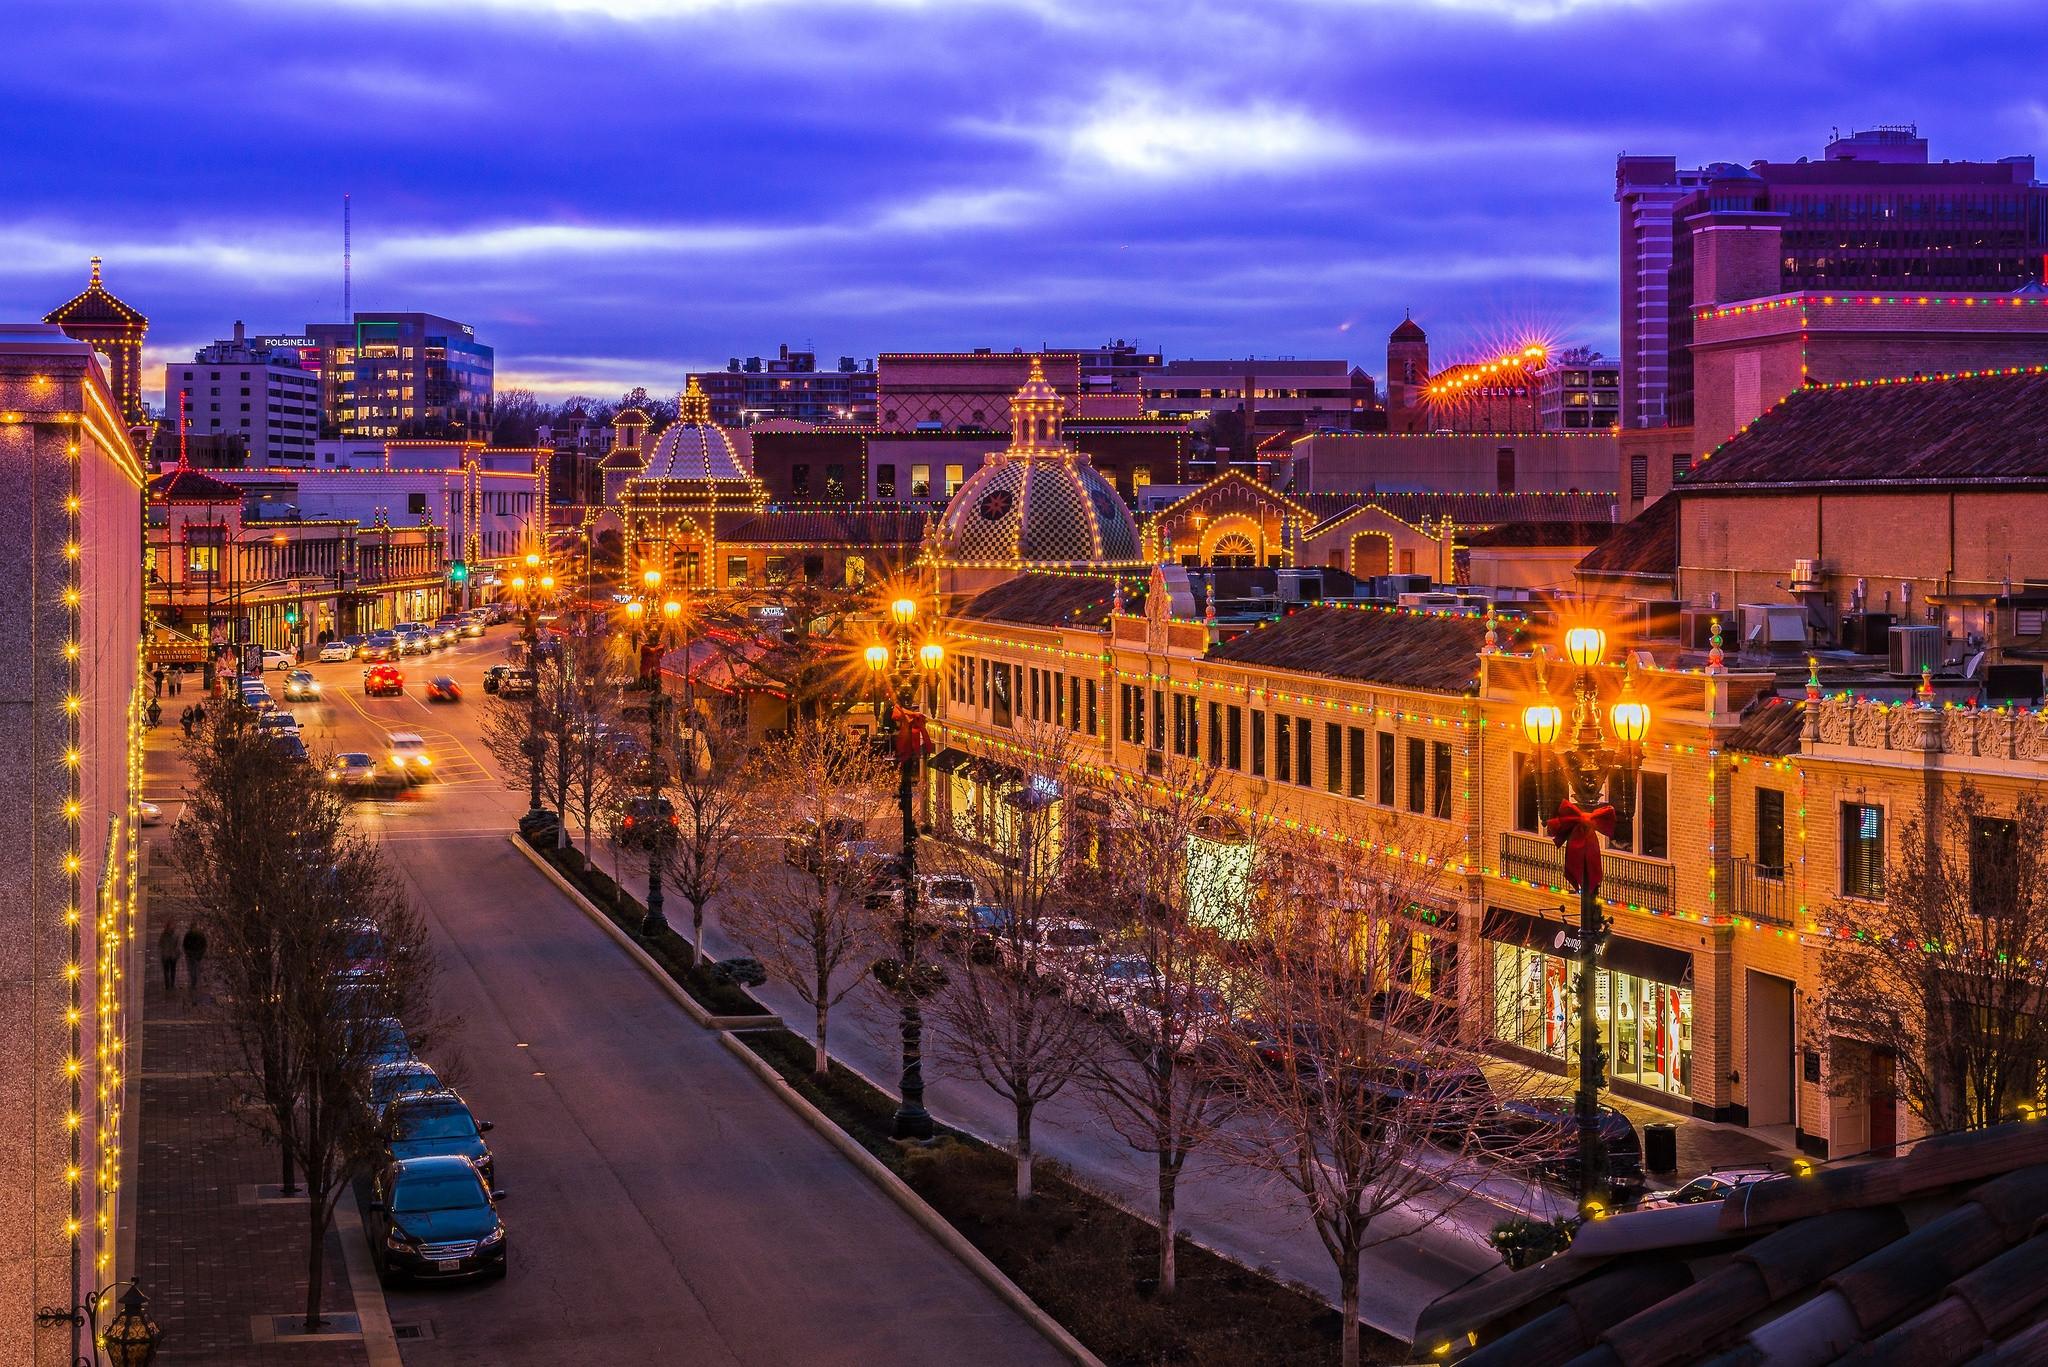 обои Канзас-Сити, Миссури, Город, США картинки фото